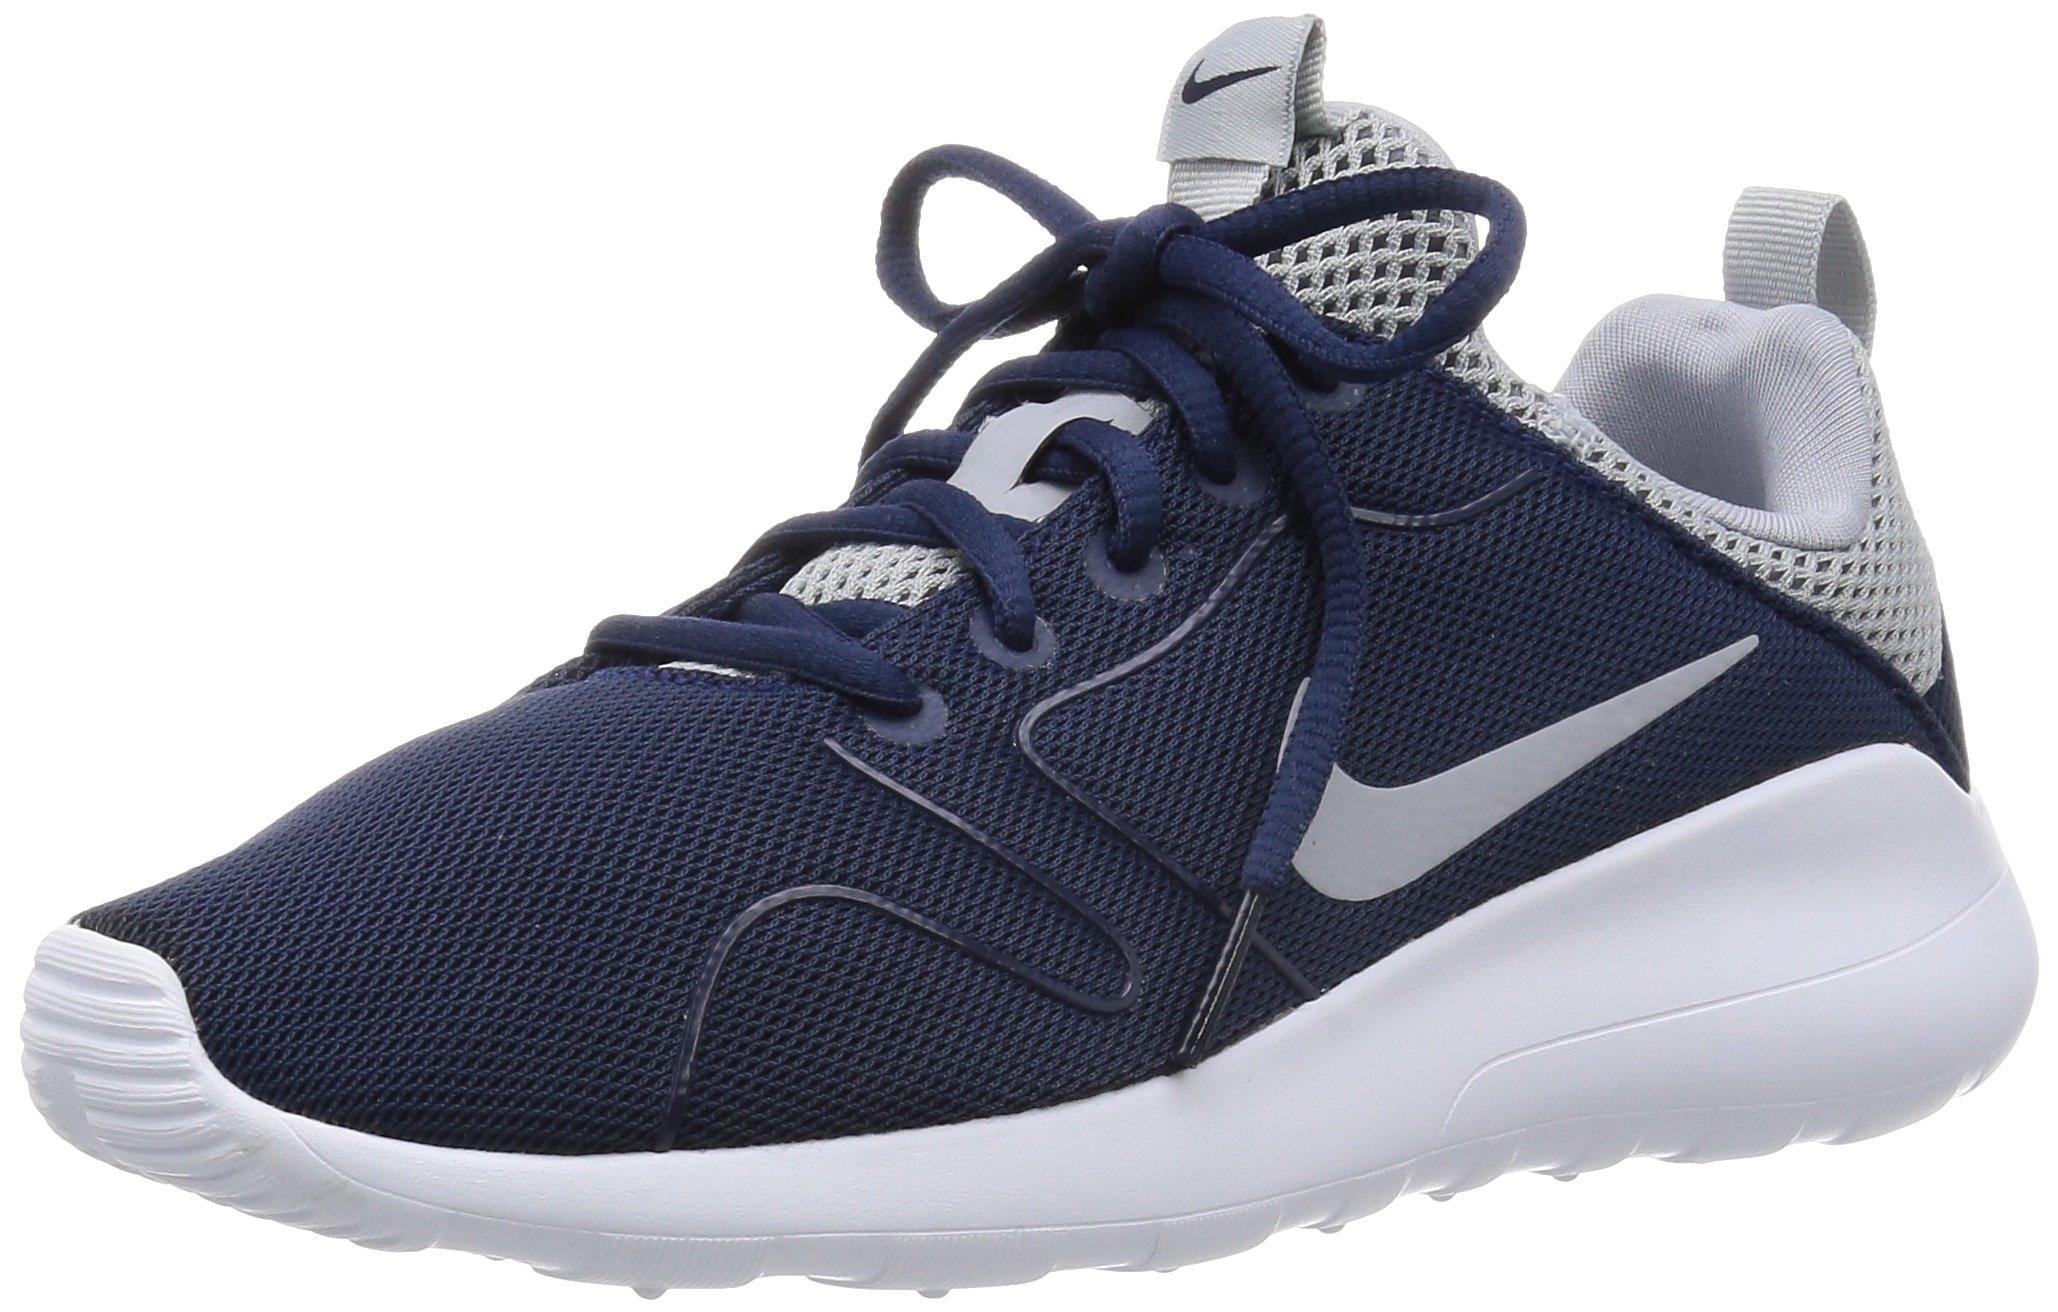 finest selection ab964 4e05e Galleon - Nike Men s Kaishi 2.0 Midnight Navy Wolf Grey-white Running Shoe  - 14 D(M) US